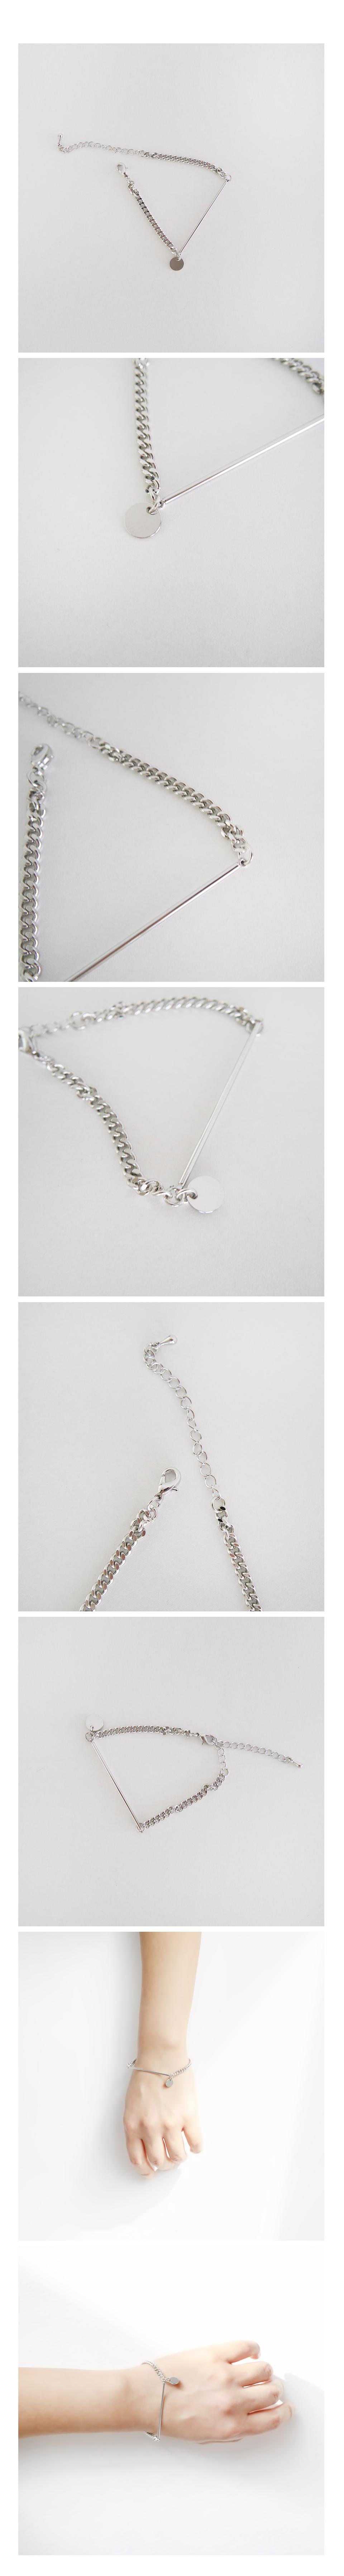 Stick chain B